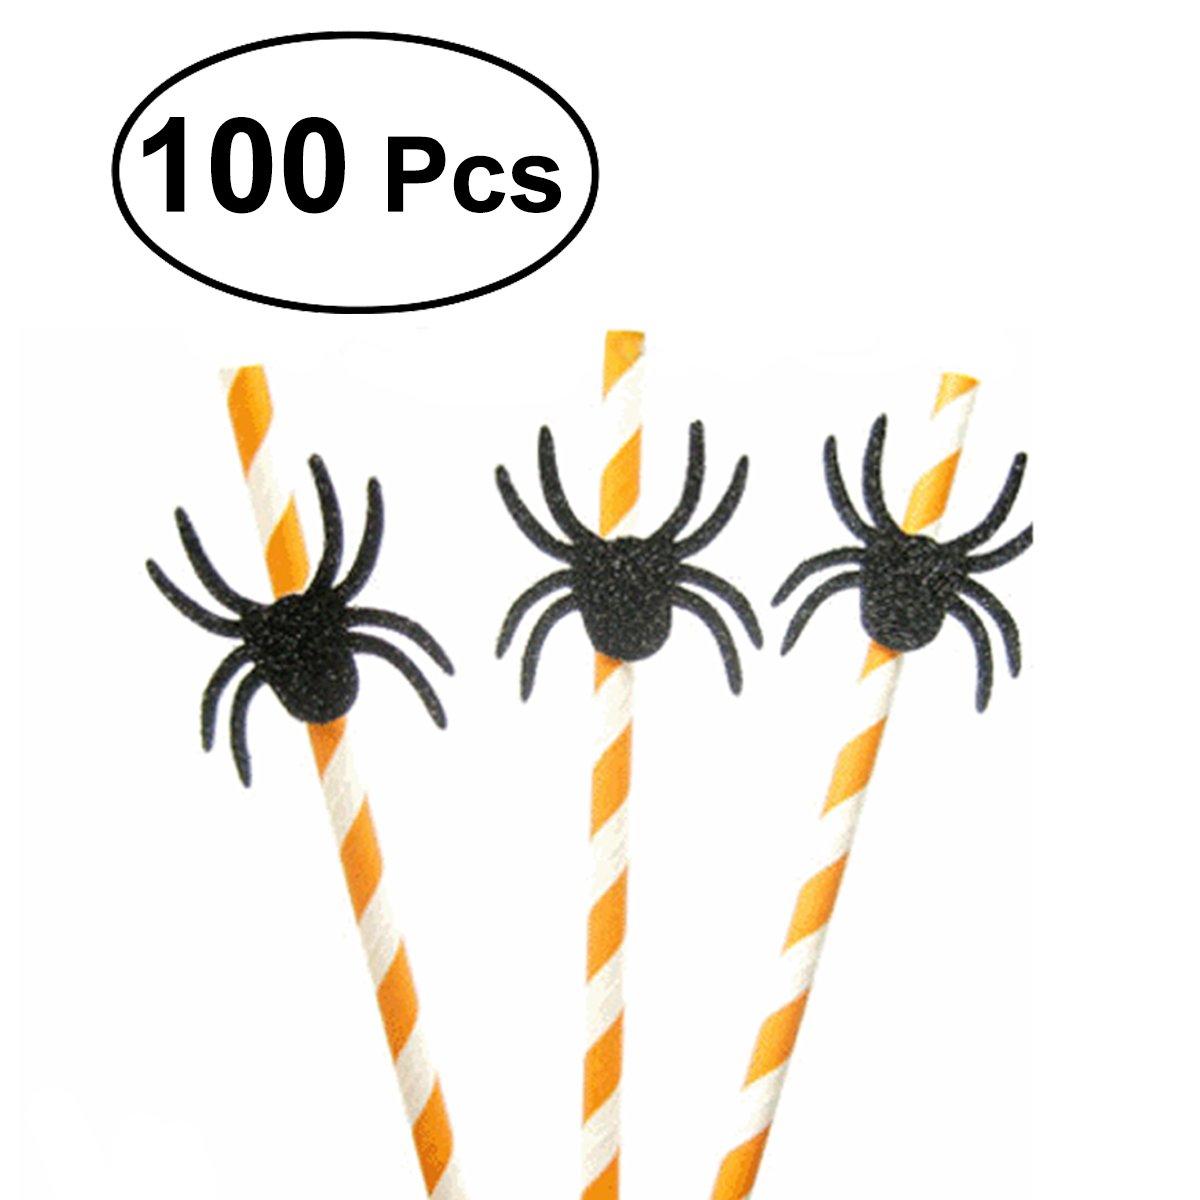 LUOEM 100 PCS Novedad serie de Halloween pajitas con Toppers Cake Topper para cumpleaños decoración de fiesta de Halloween (araña)